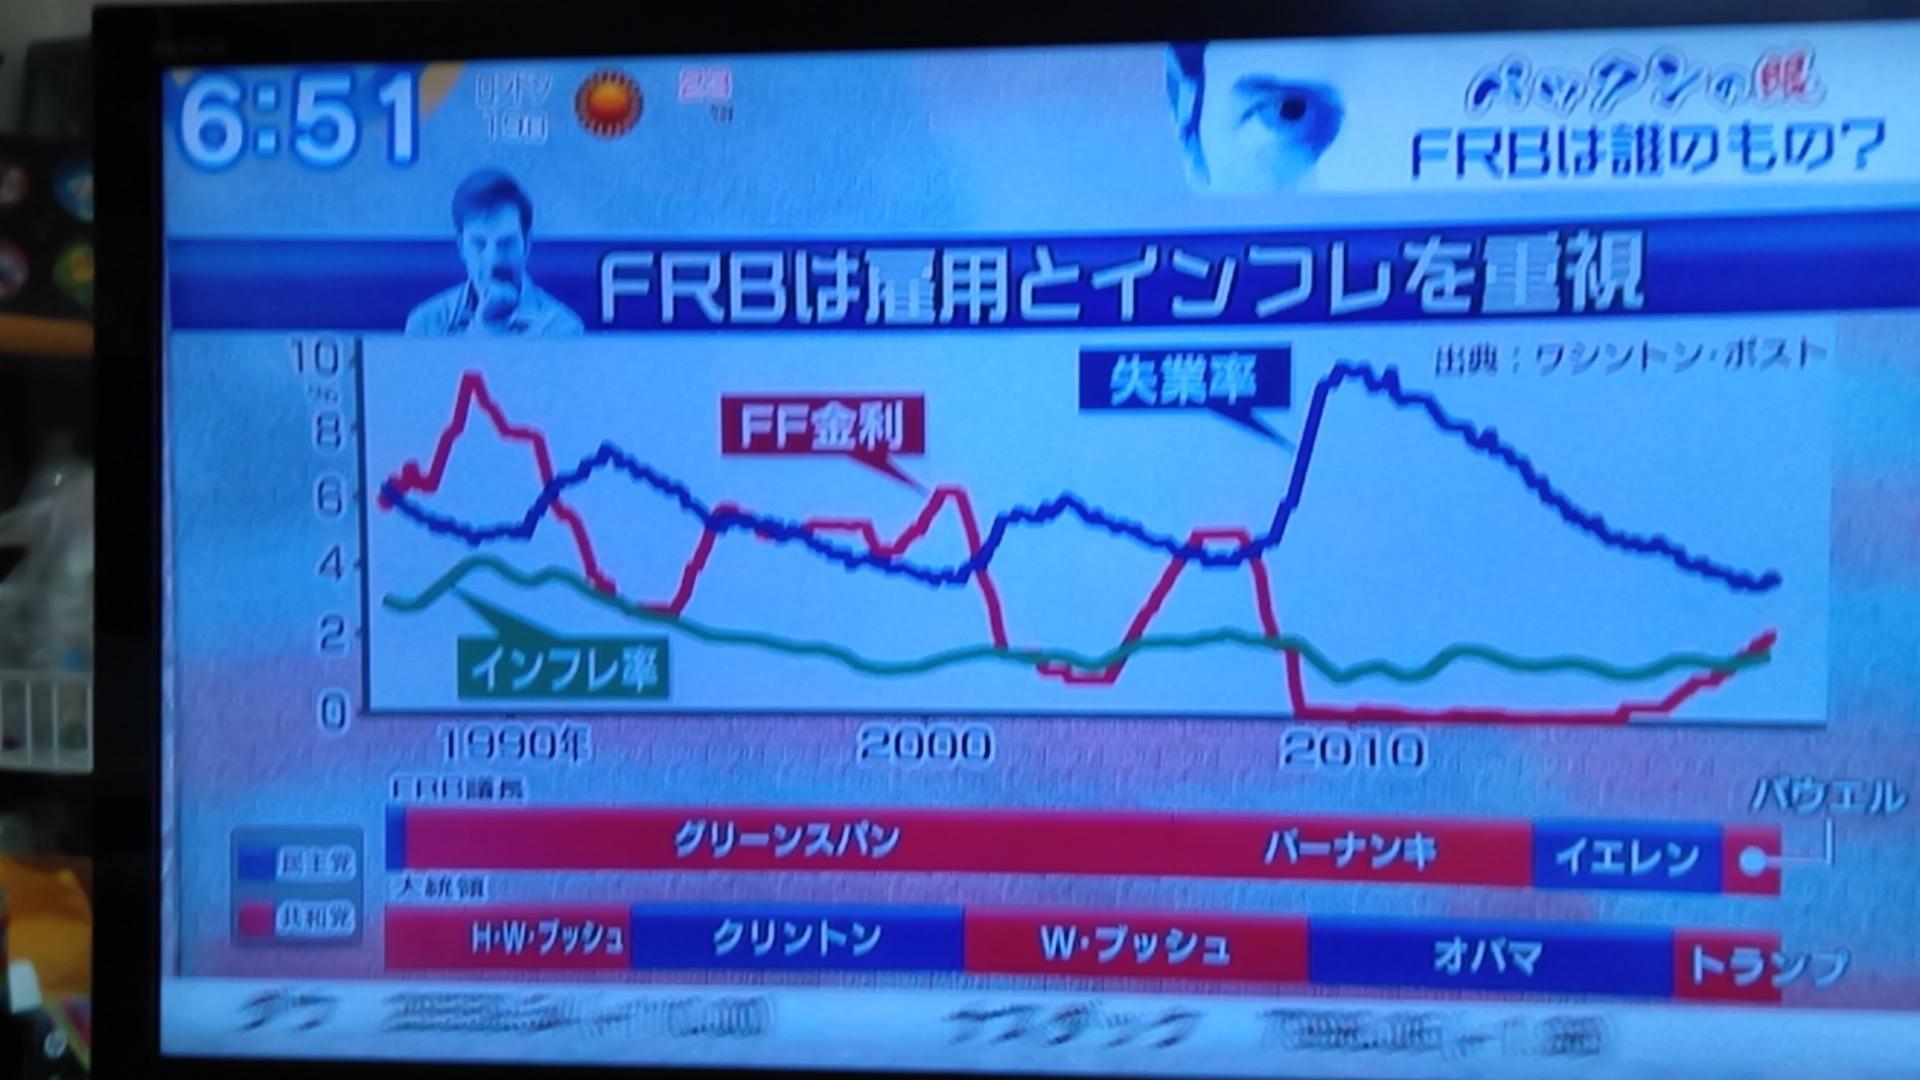 FRBの経済視点は_d0262085_06585605.jpg